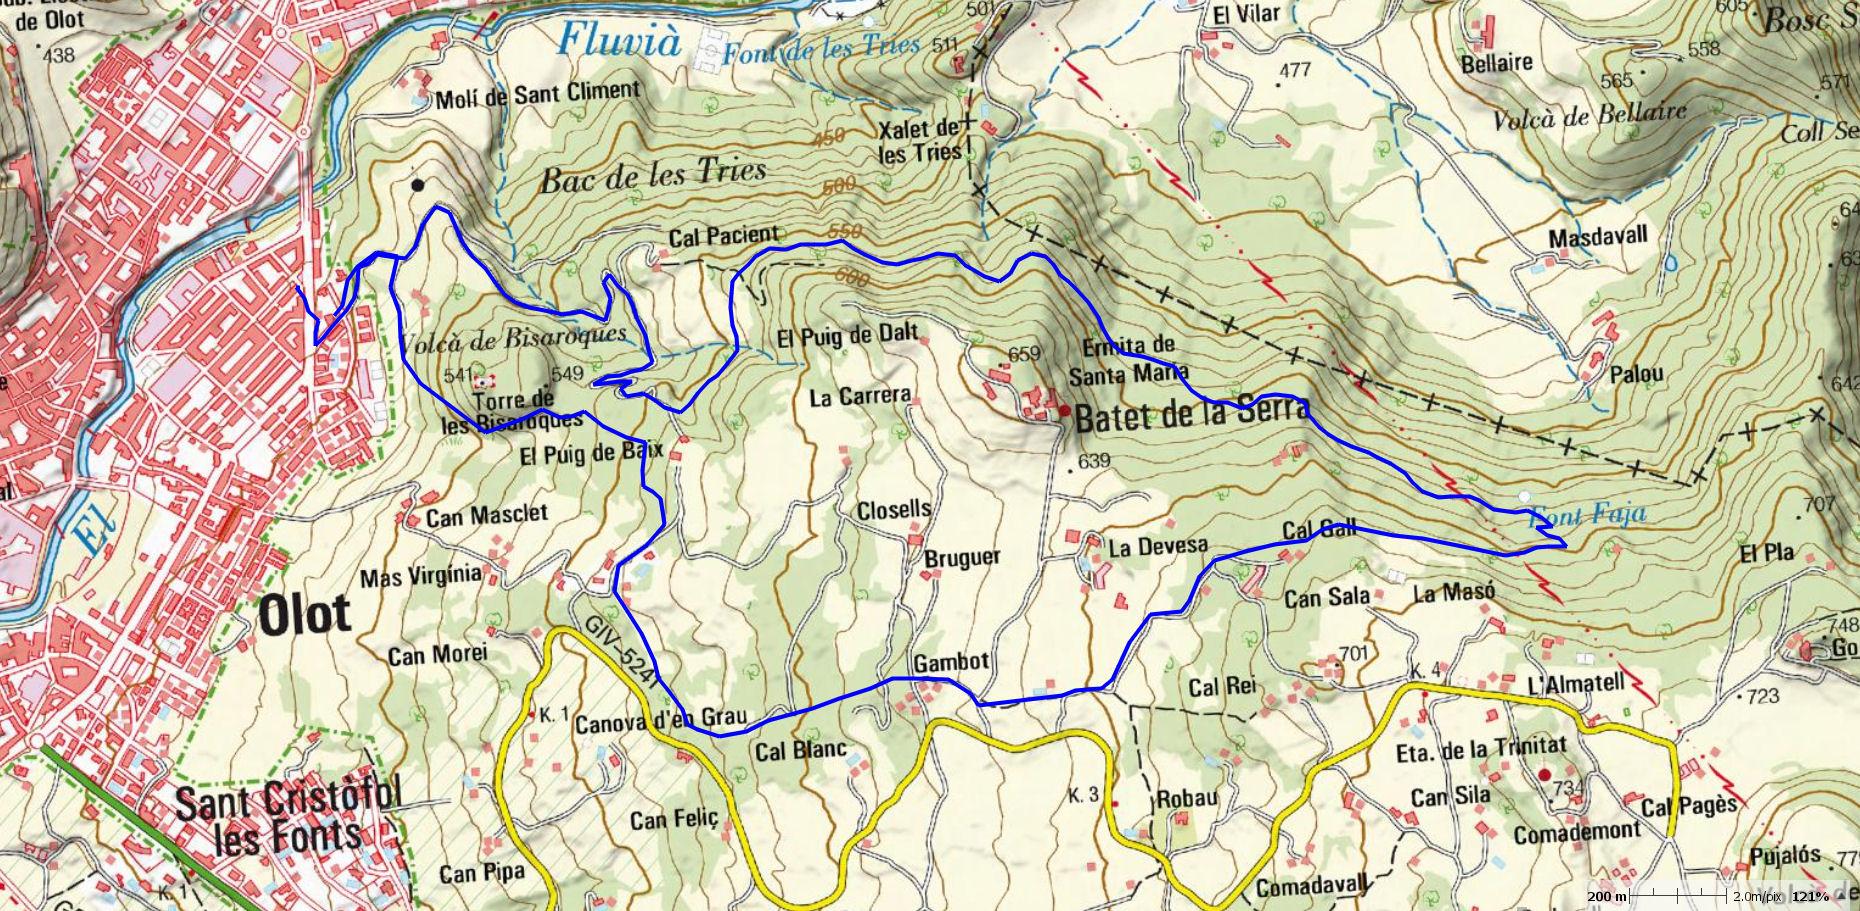 OLOT-FONT-FAJA-MAP